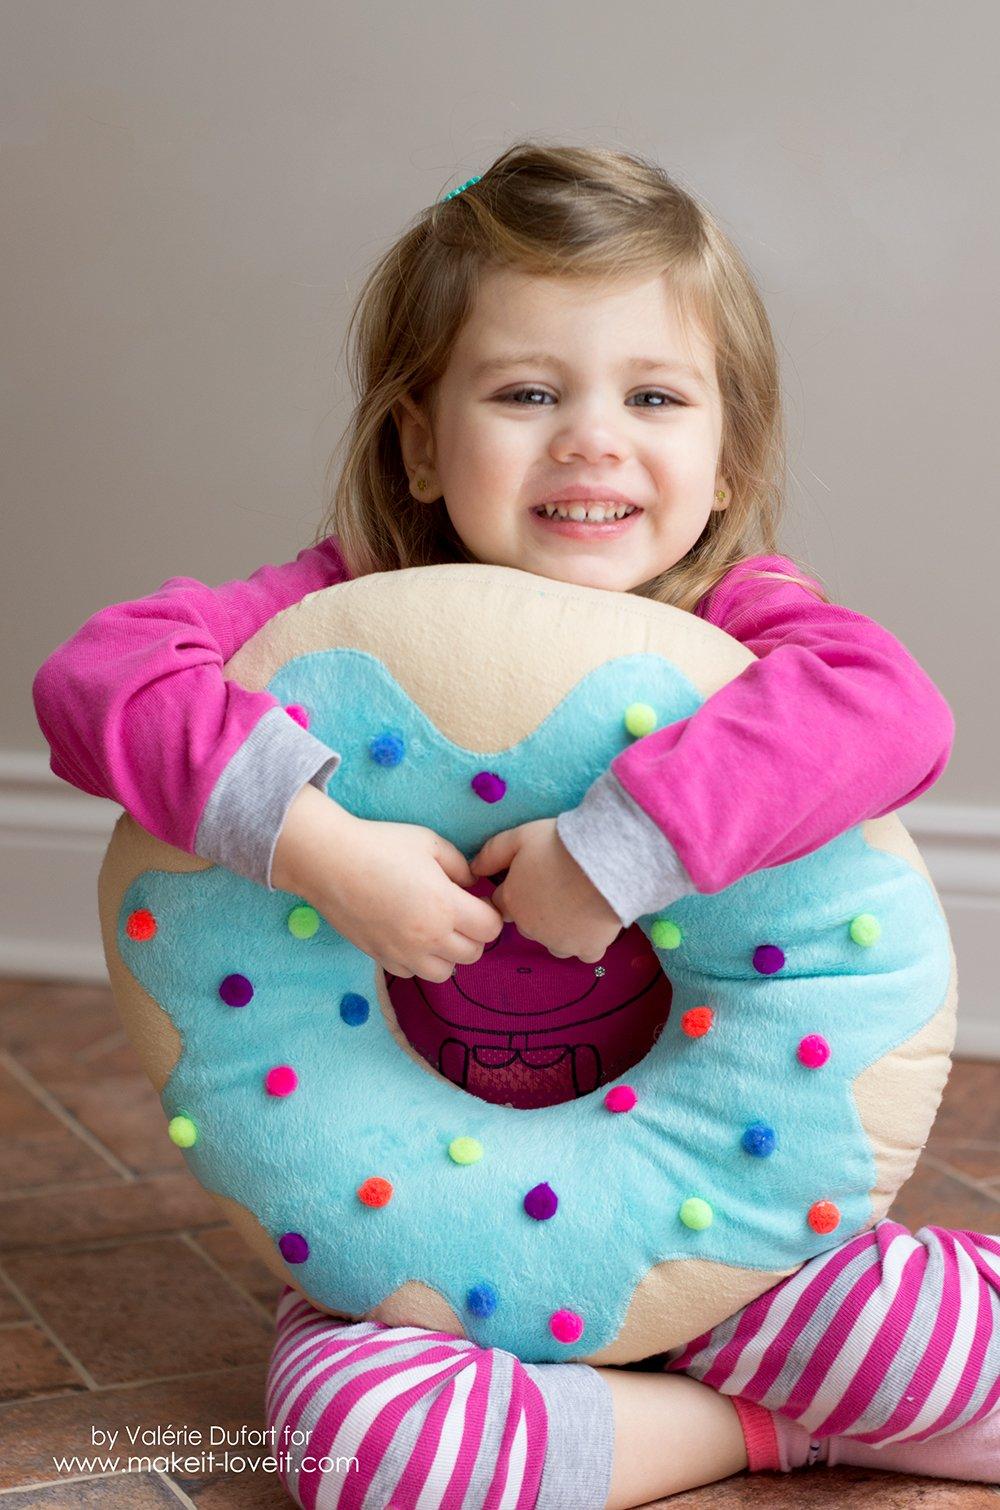 Delicious Donut Pillow Tutorial   via www.makeit-loveit.com